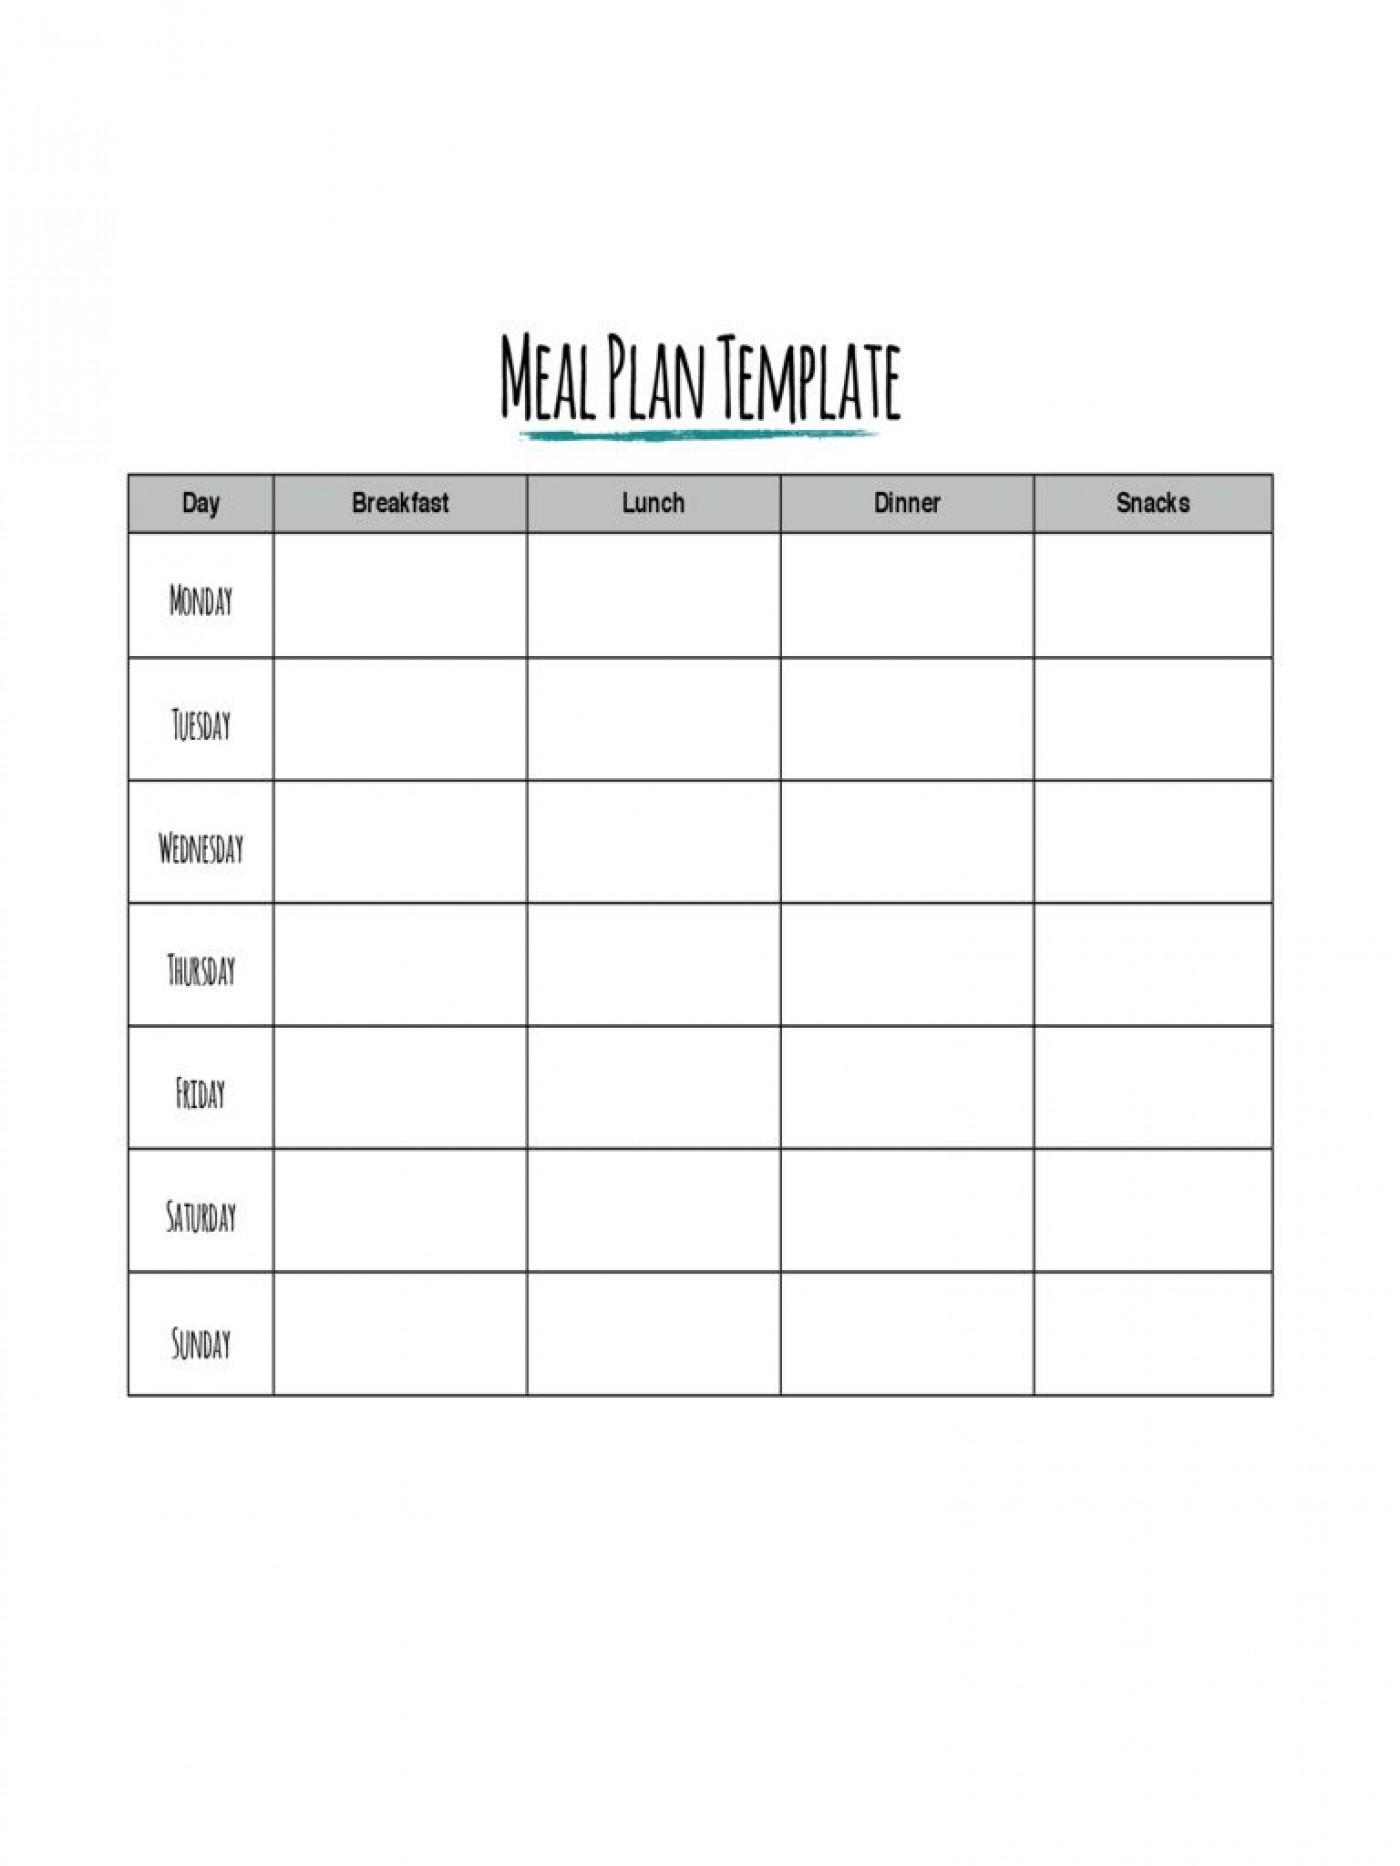 002 Impressive Meal Plan Printable Pdf High Def  Worksheet Downloadable Template Sheet1400